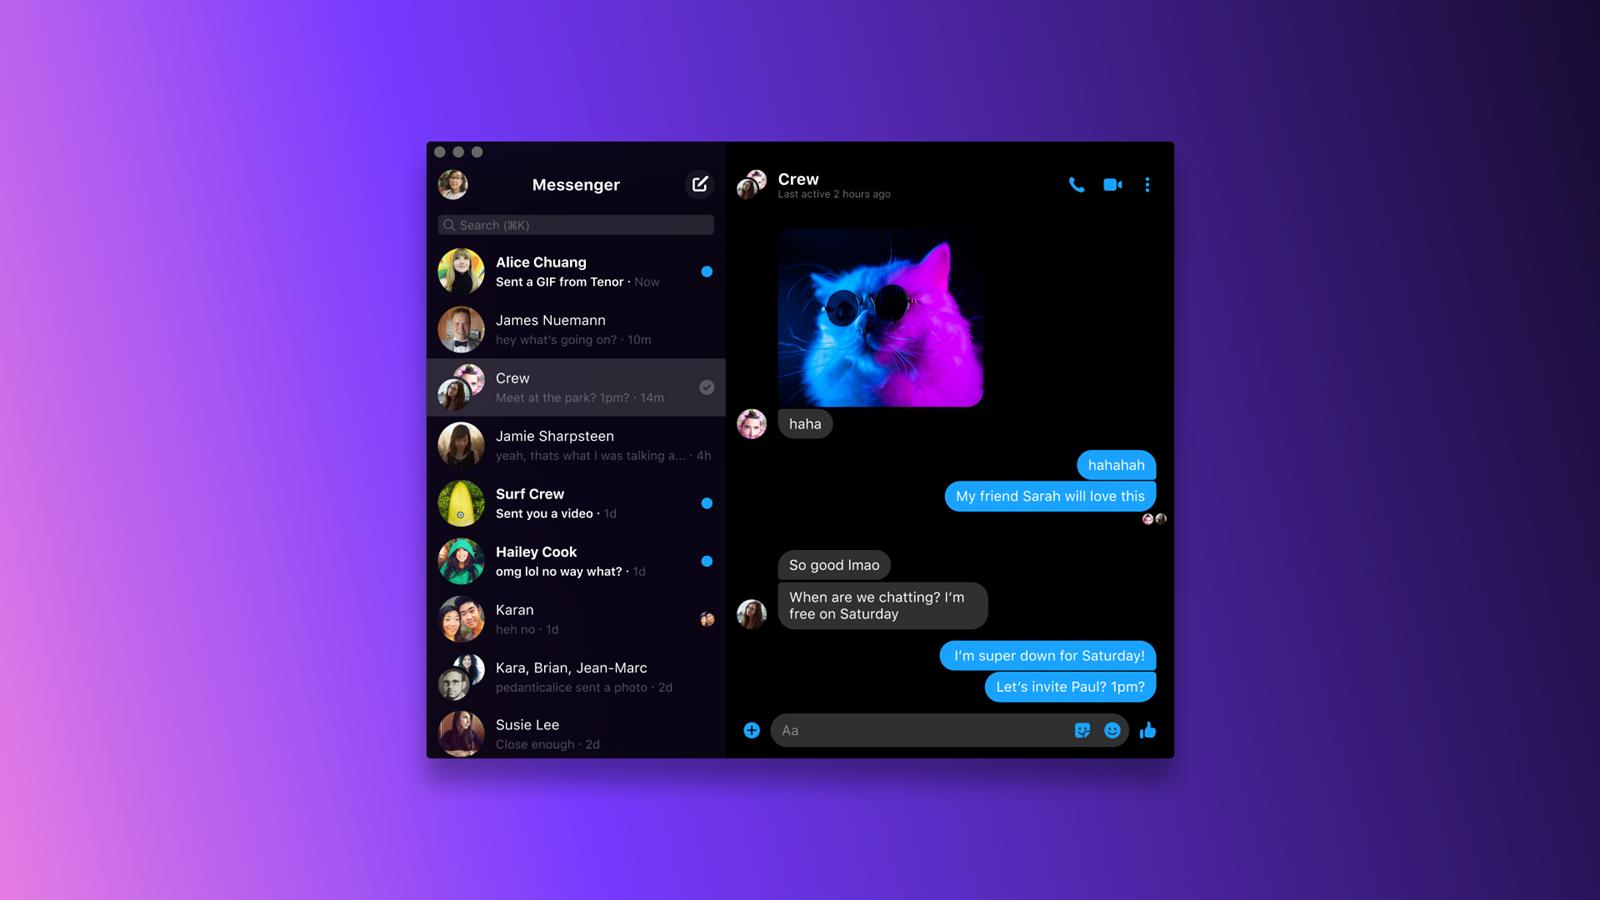 Facebook 推出可以用於群組視頻通話的新版 Messenger 桌面 (PC/Mac) 應用程式 @3C 達人廖阿輝